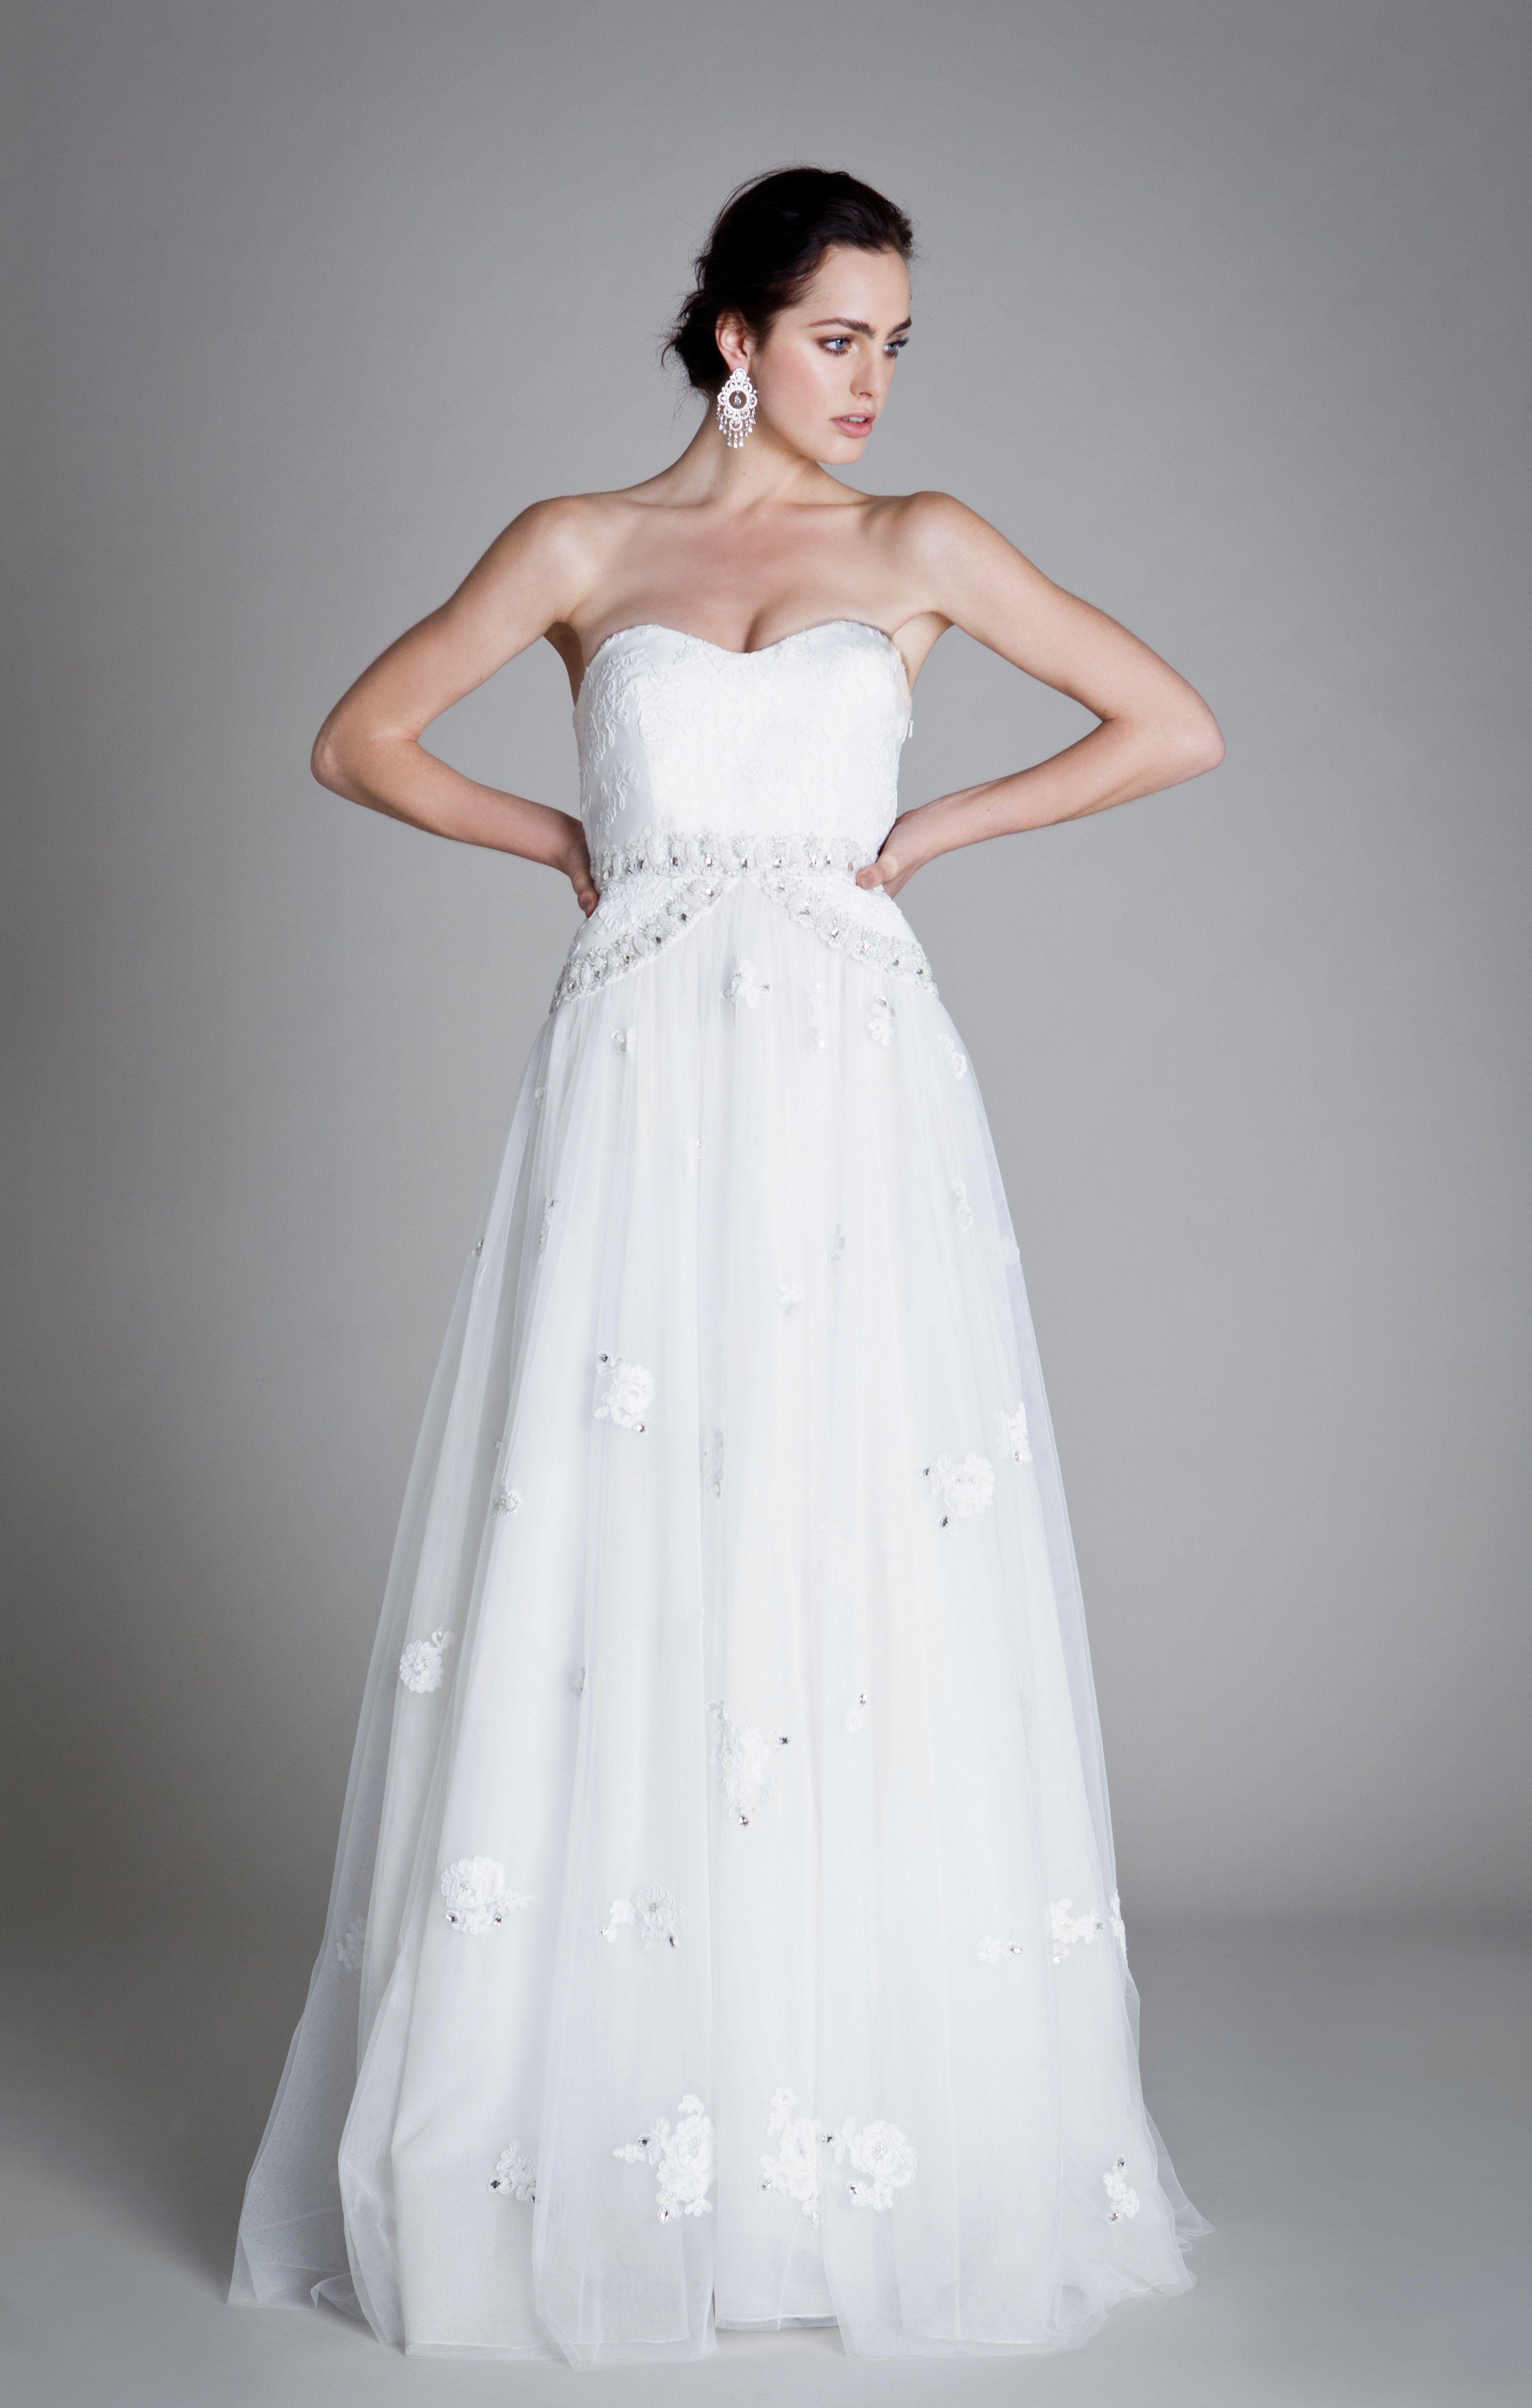 Temperley Bridal, Beatrice Collection, Vida Dress